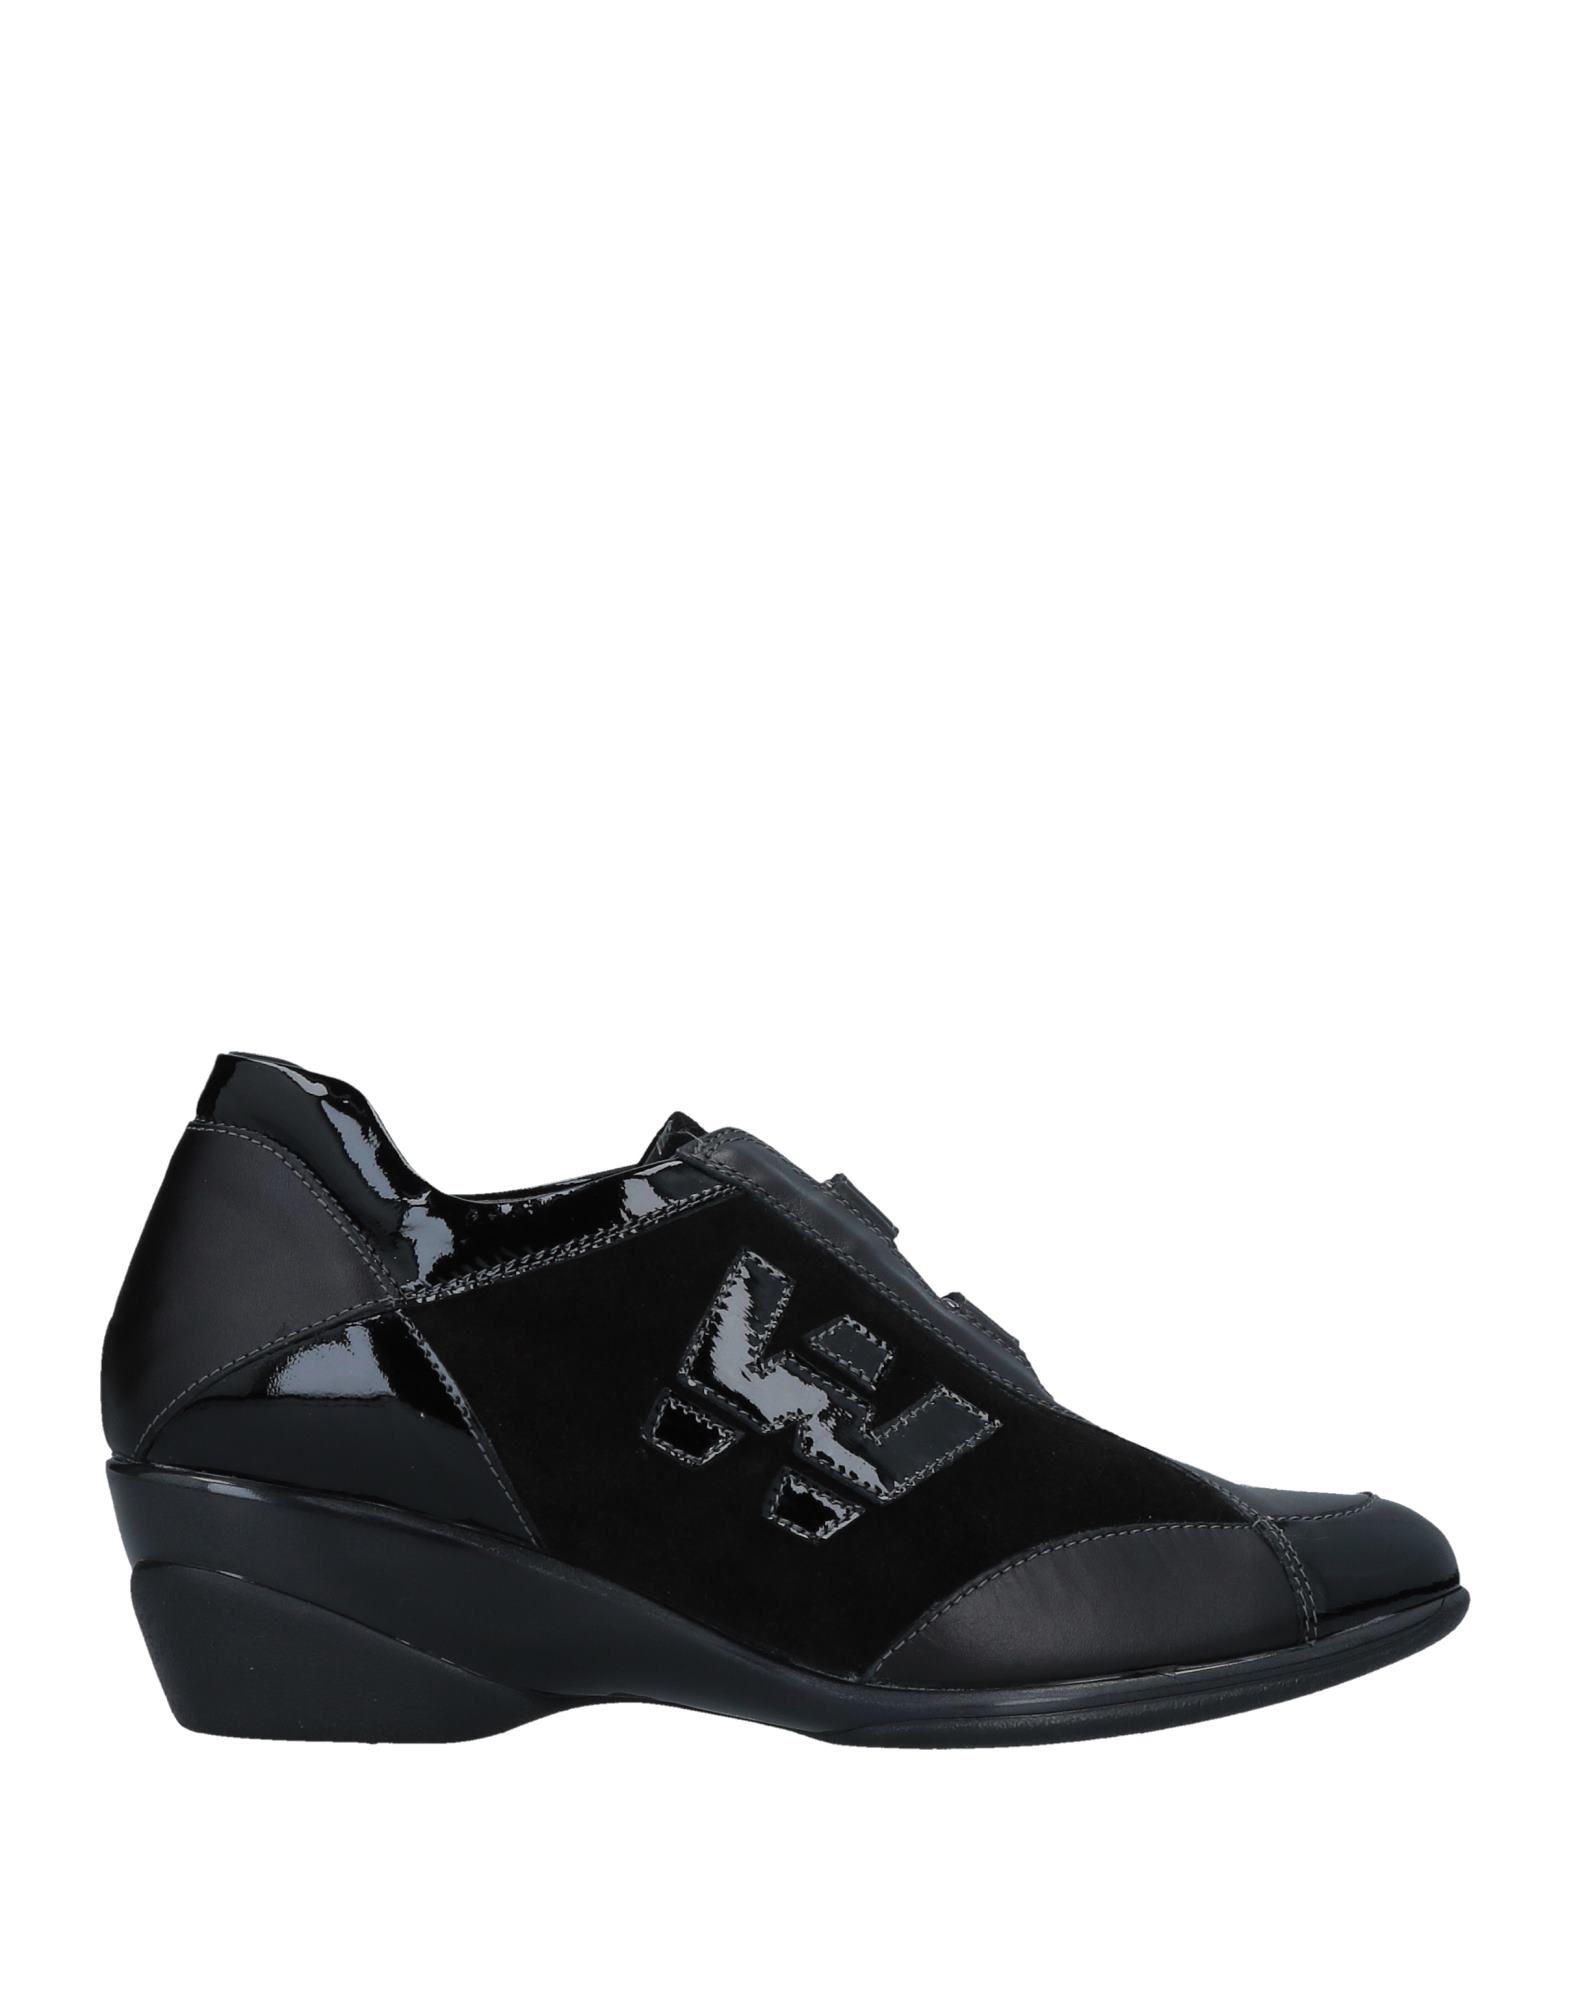 Walk By Melluso Sneakers Damen  11507298NI Gute Qualität beliebte Schuhe